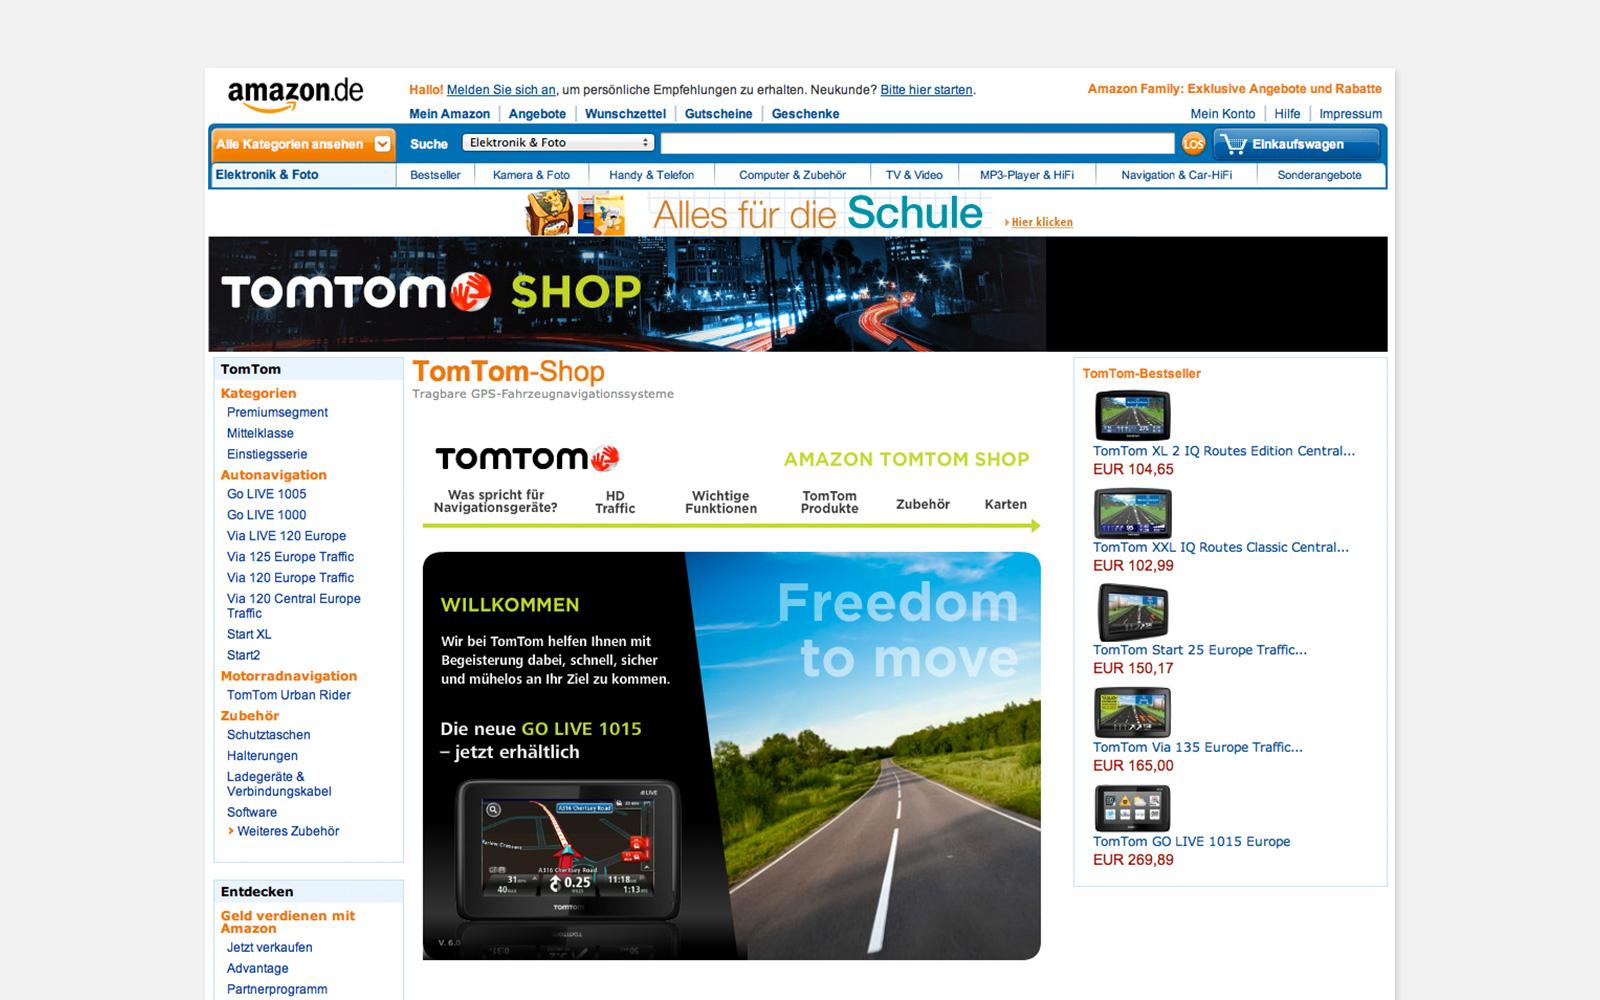 TomTom brand shop